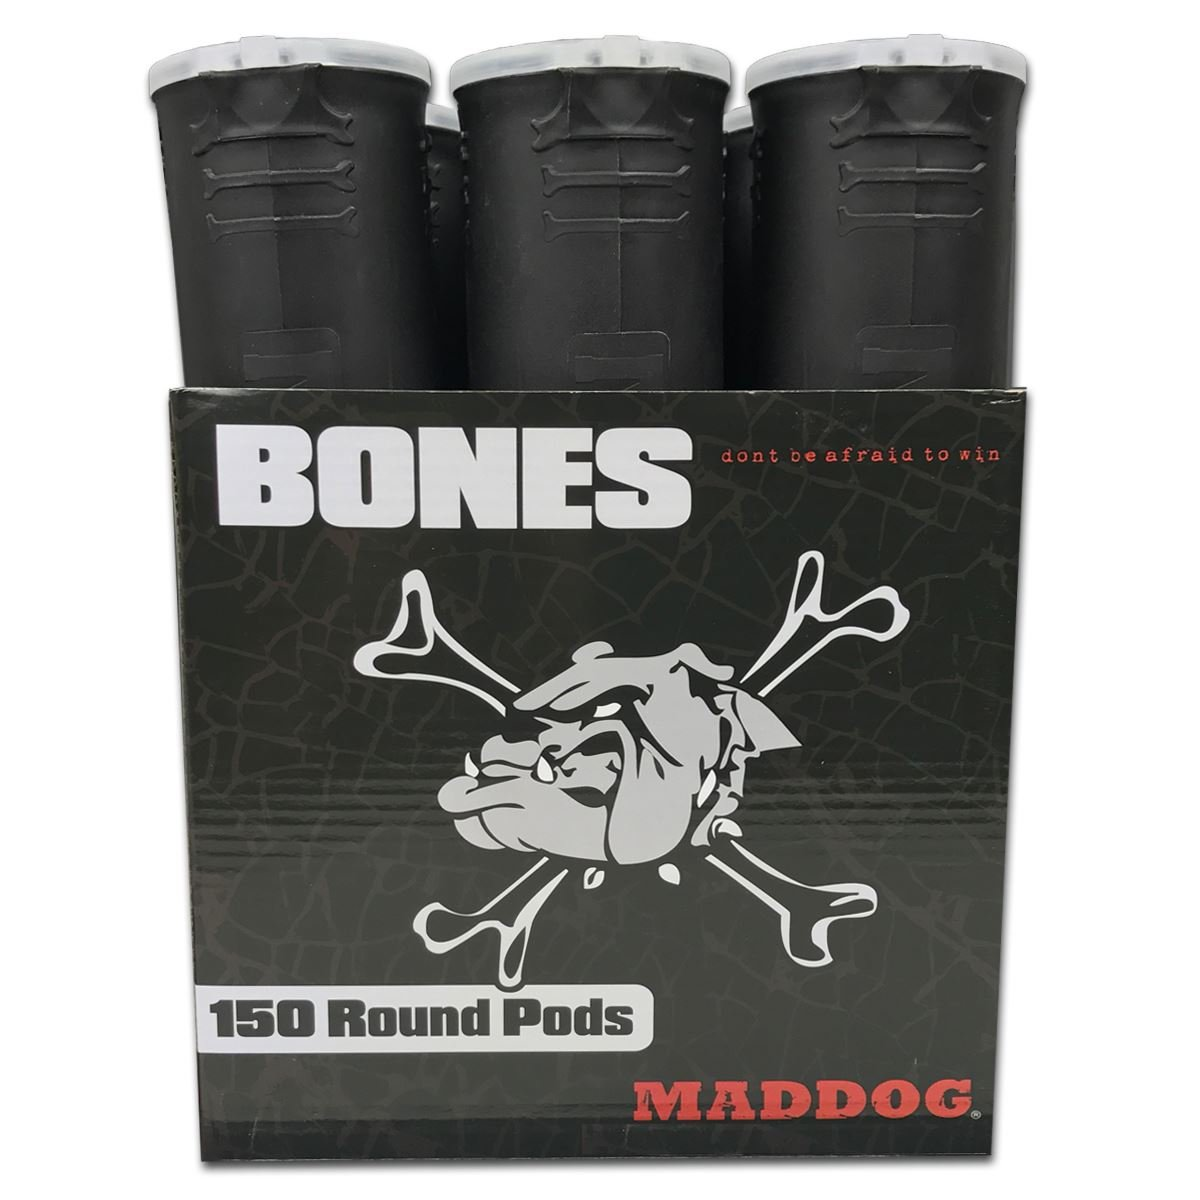 MAddog 150 Round Bones Paintball Pods - Black - 6 Pack by MAddog